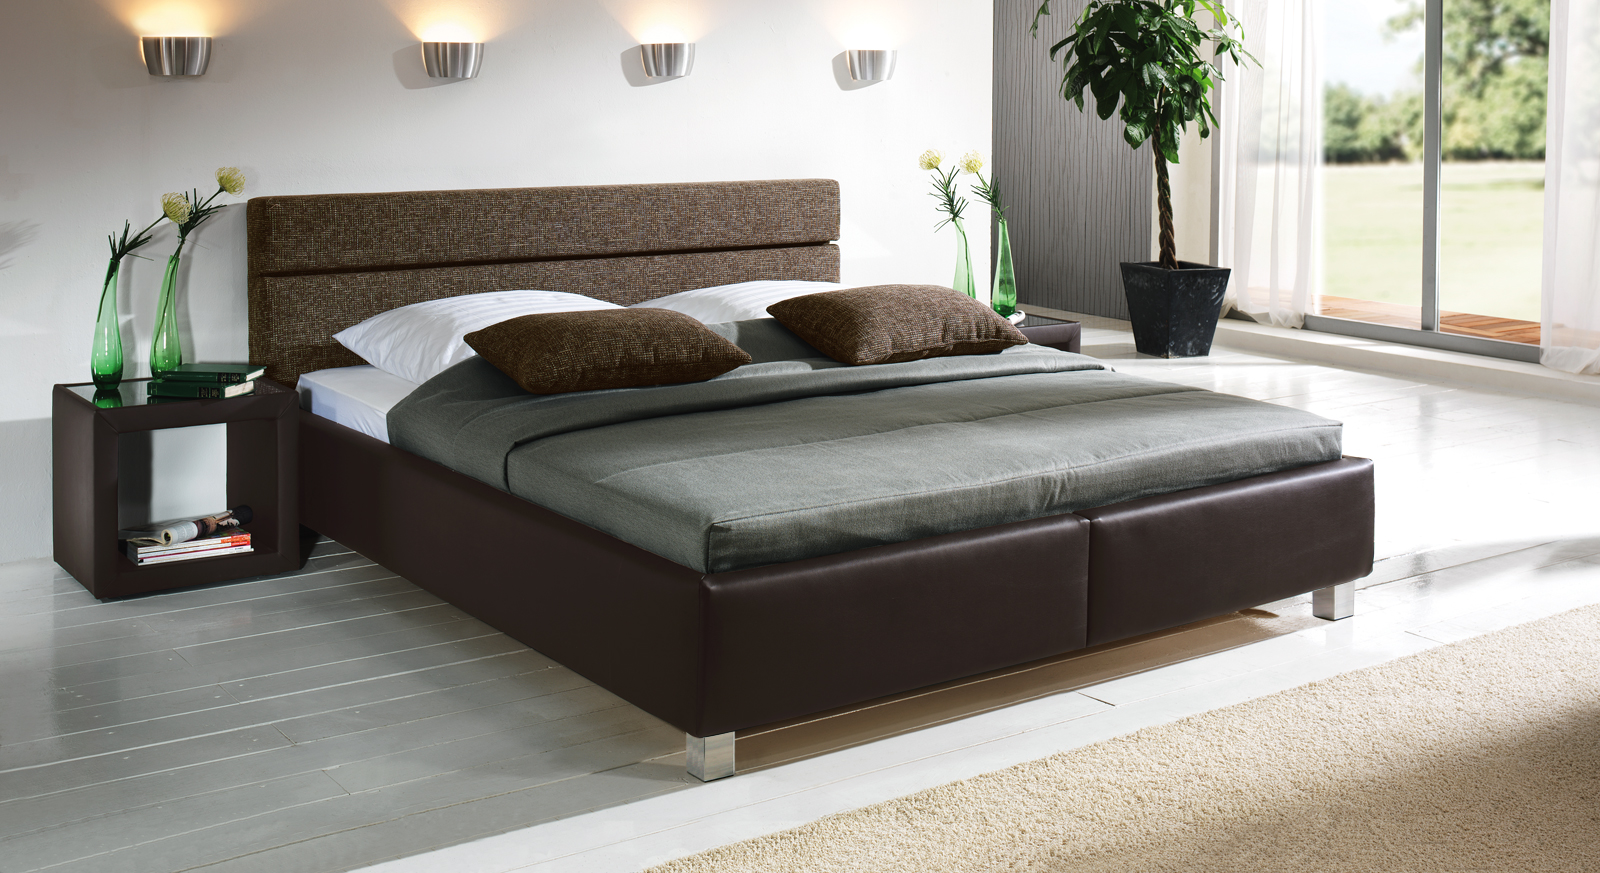 bella luna spannbettlaken in dunkel braun bett bezug f r wasserbetten boxspringbetten. Black Bedroom Furniture Sets. Home Design Ideas